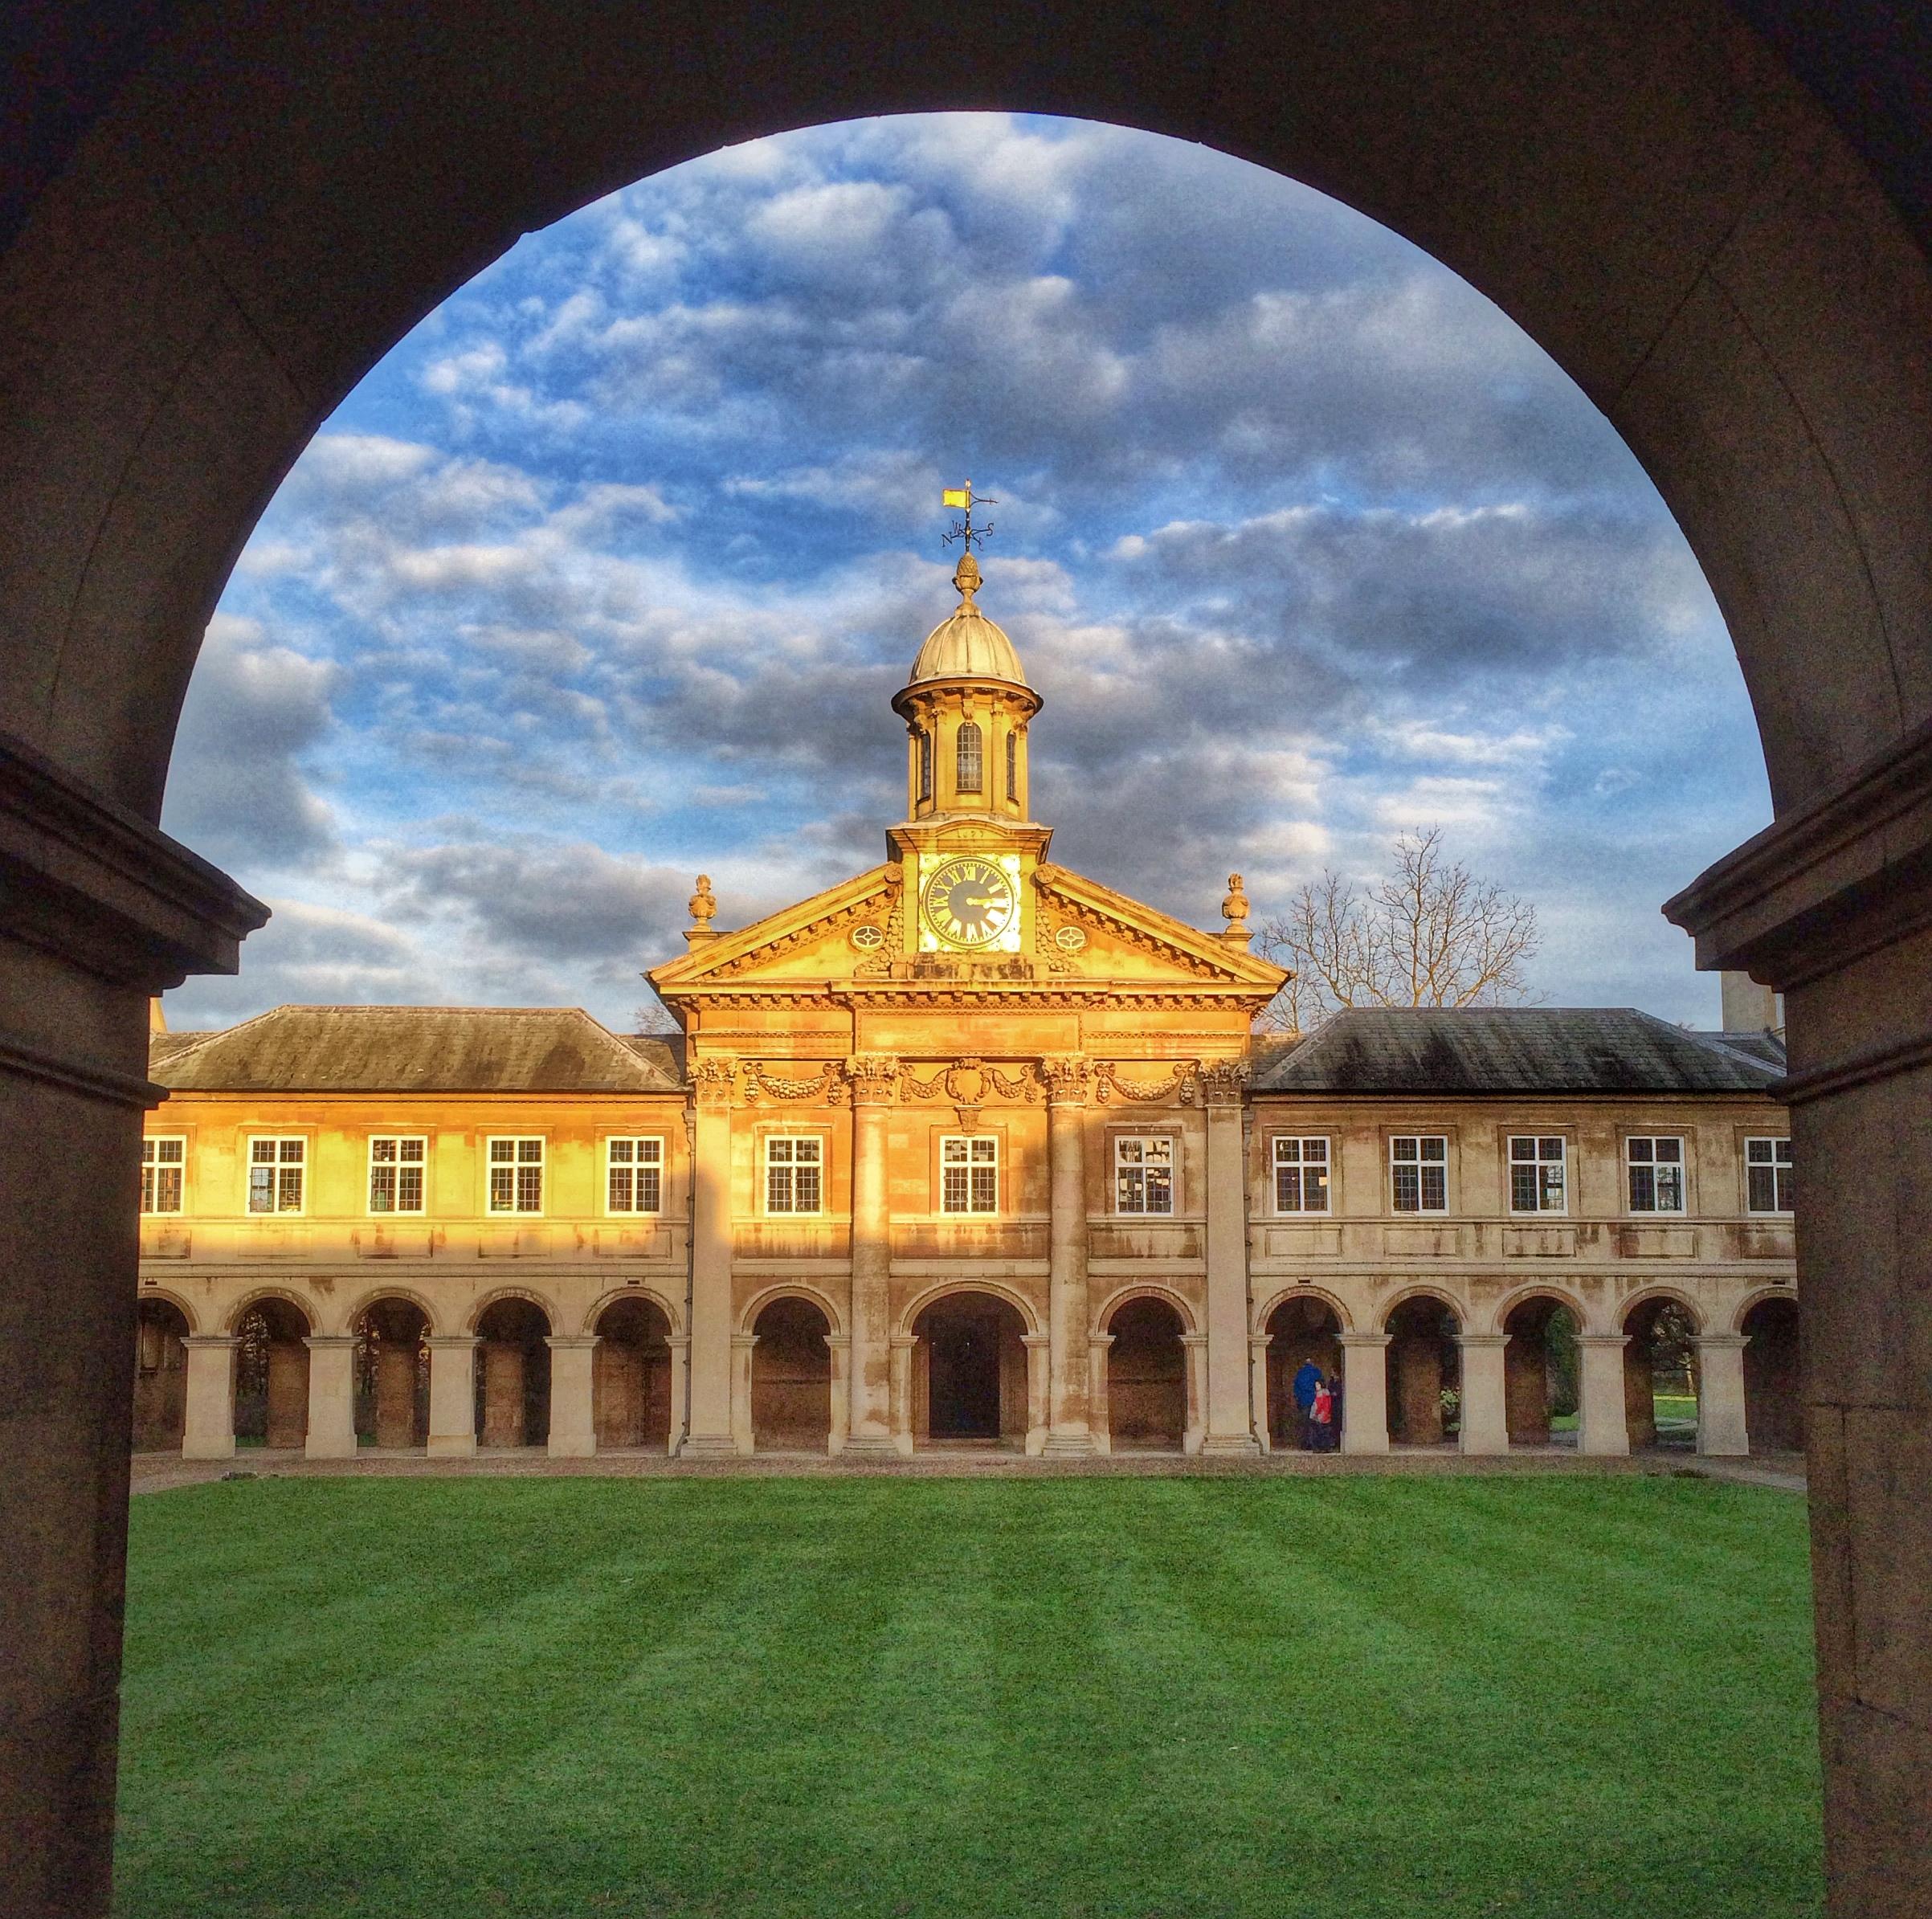 Gates Cambridge Class of 2018 announced